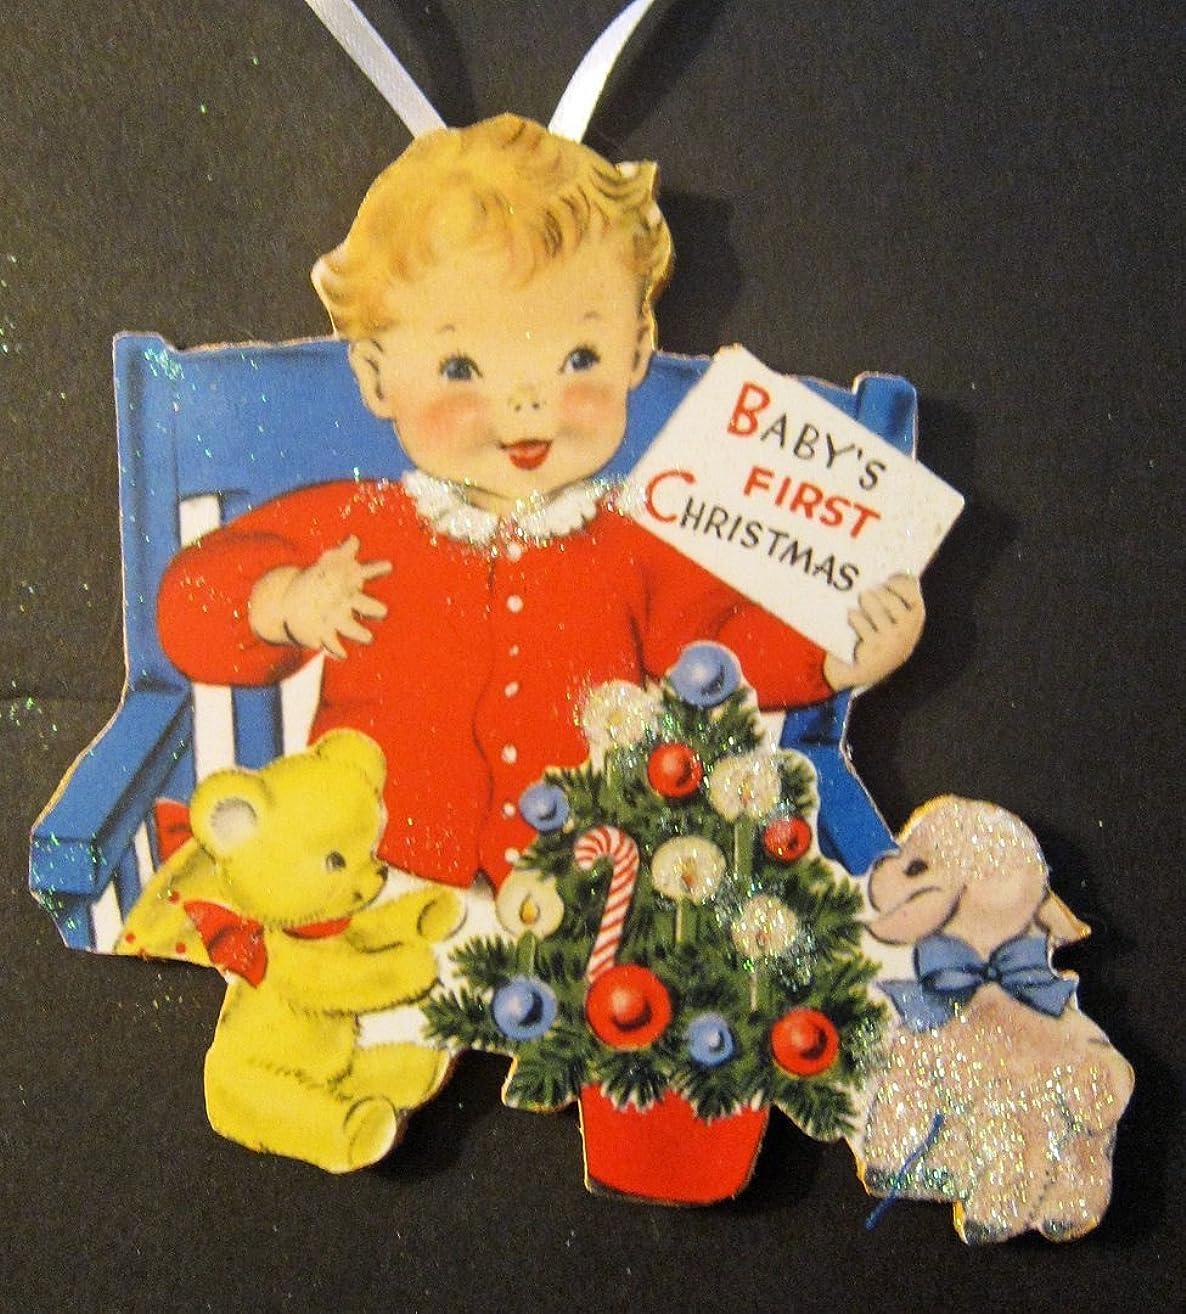 Baby's 1st Christmas Ornament Handcrafted Wood,Newborn Gift, Vintage Baby Card Nursery Decoration, Teddy Bear White Lamb, Blue High Chair Keepsake